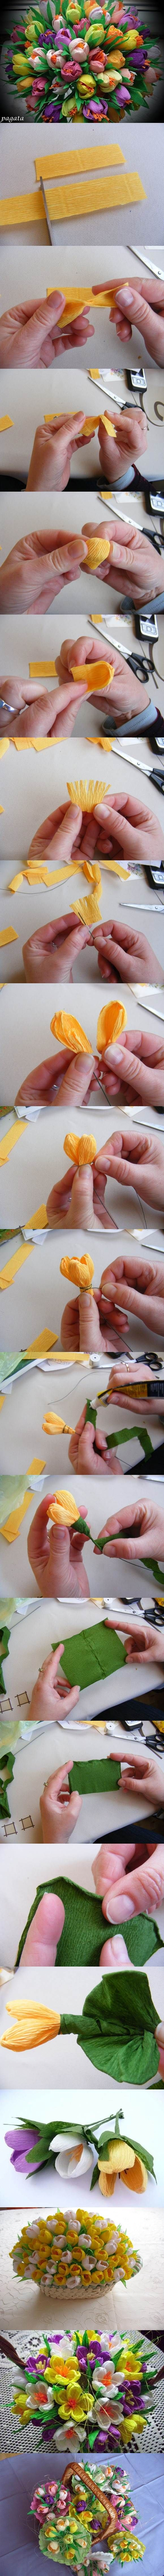 DIY  Centro de flores de papel http://www.icreativeideas.com/diy-beautiful-bouquet-of-crepe-paper-crocuses/